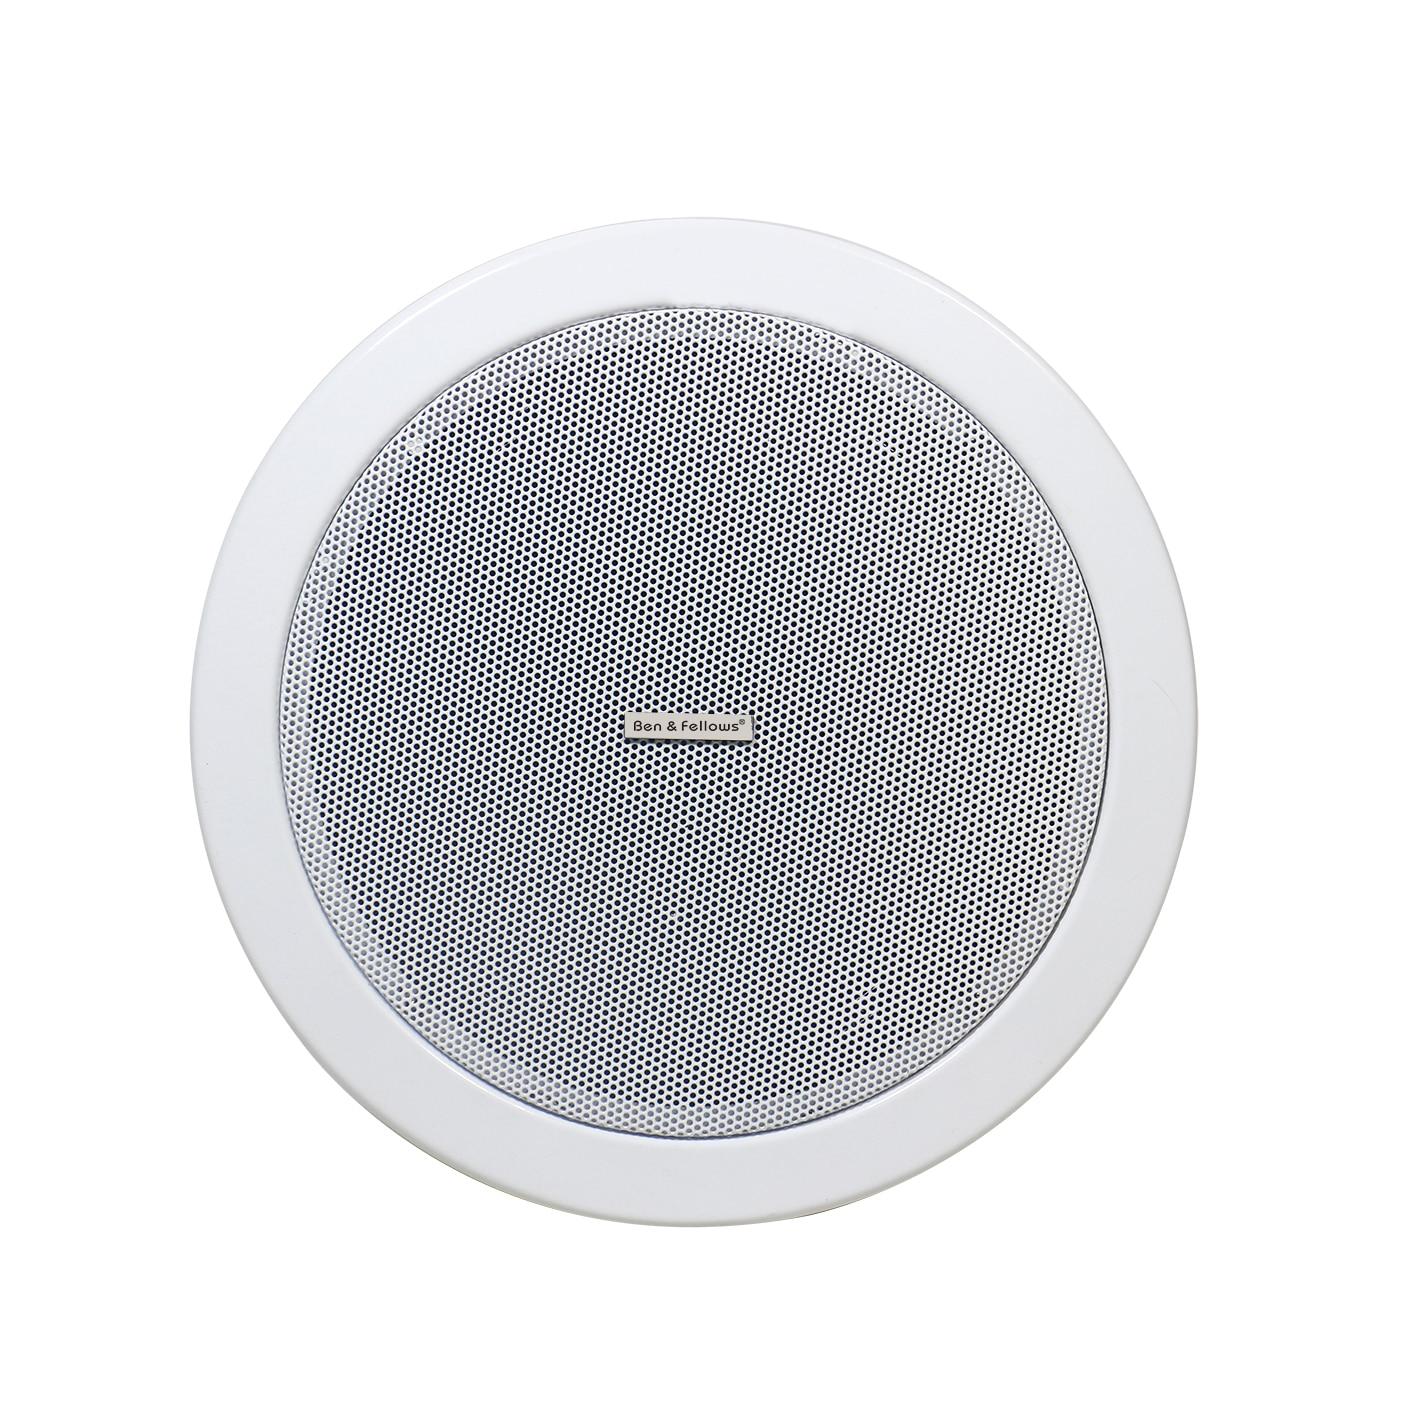 Ben & Fellows Dante network In ceiling Speaker Metal 15W 6 inch with RJ45 port, supports POE power supply Dante speaker 1